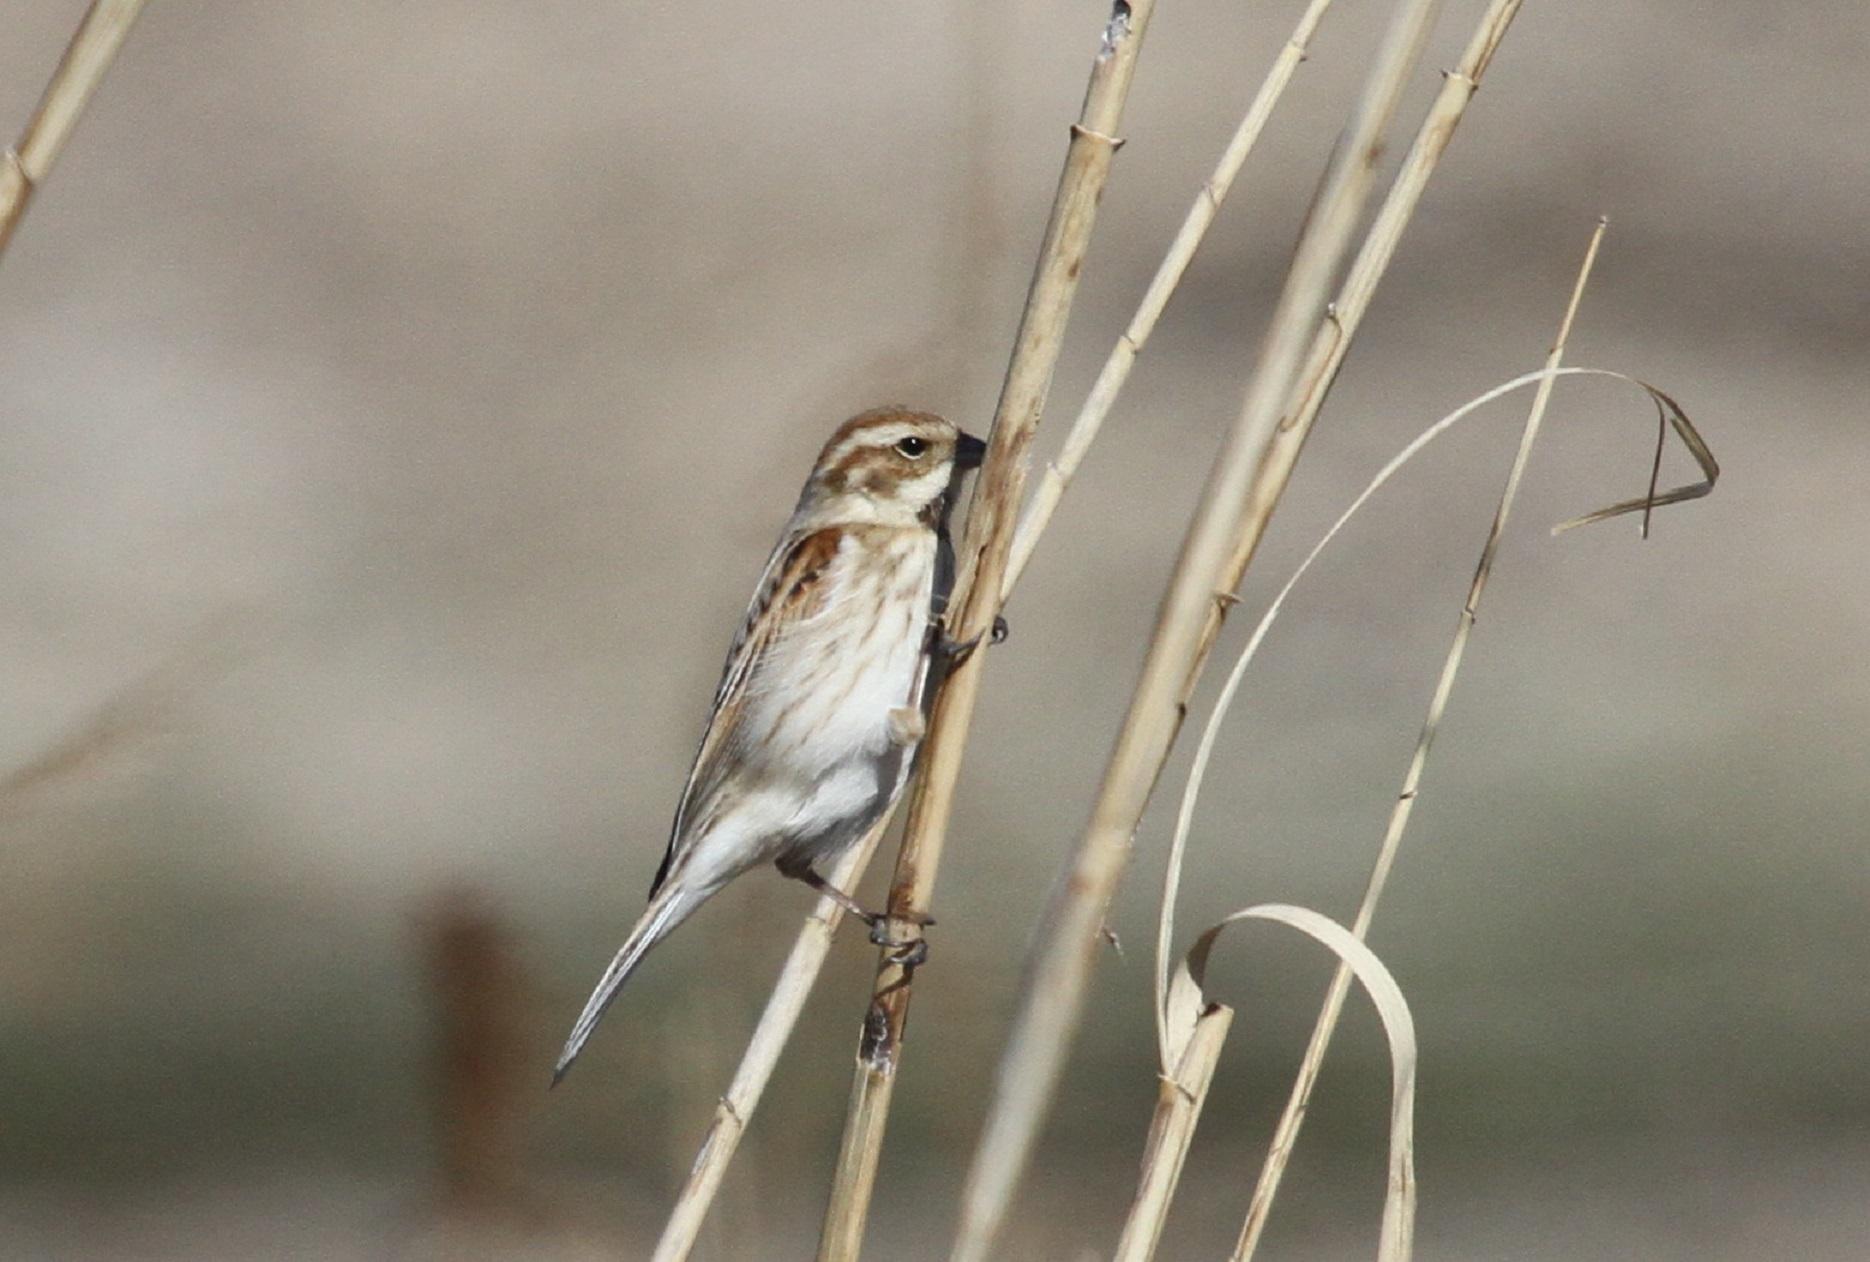 MFで出会えた、冬鳥オオジュリン冬羽から夏羽に変わりつつ_f0239515_2233432.jpg